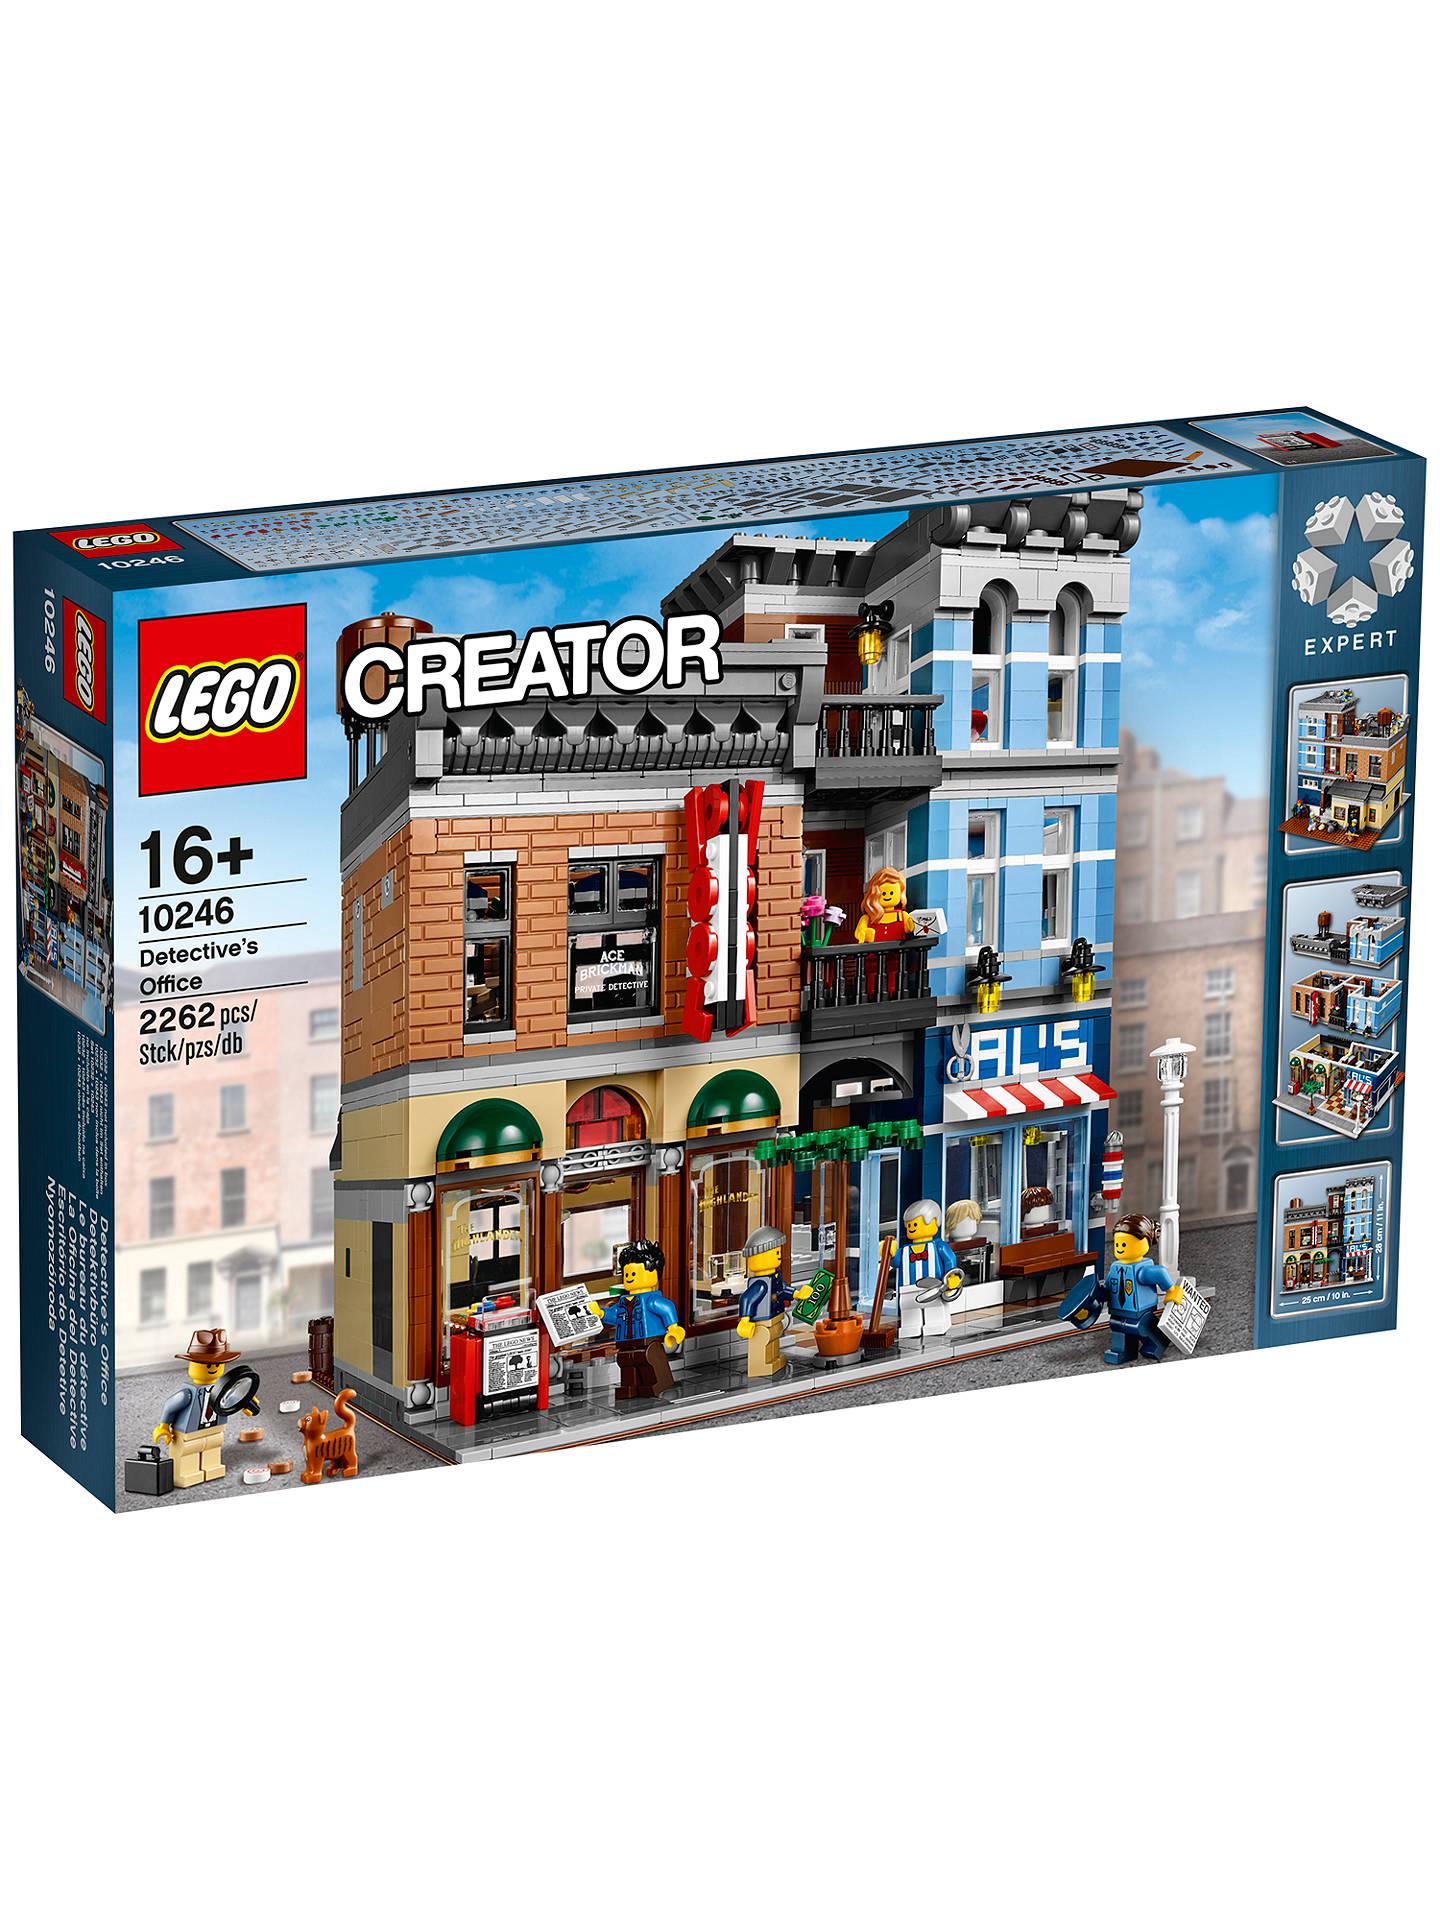 Office lego Building Buylego Creator 10246 Detectives Office Online At Johnlewis John Lewis Lego Creator 10246 Detectives Office At John Lewis Partners